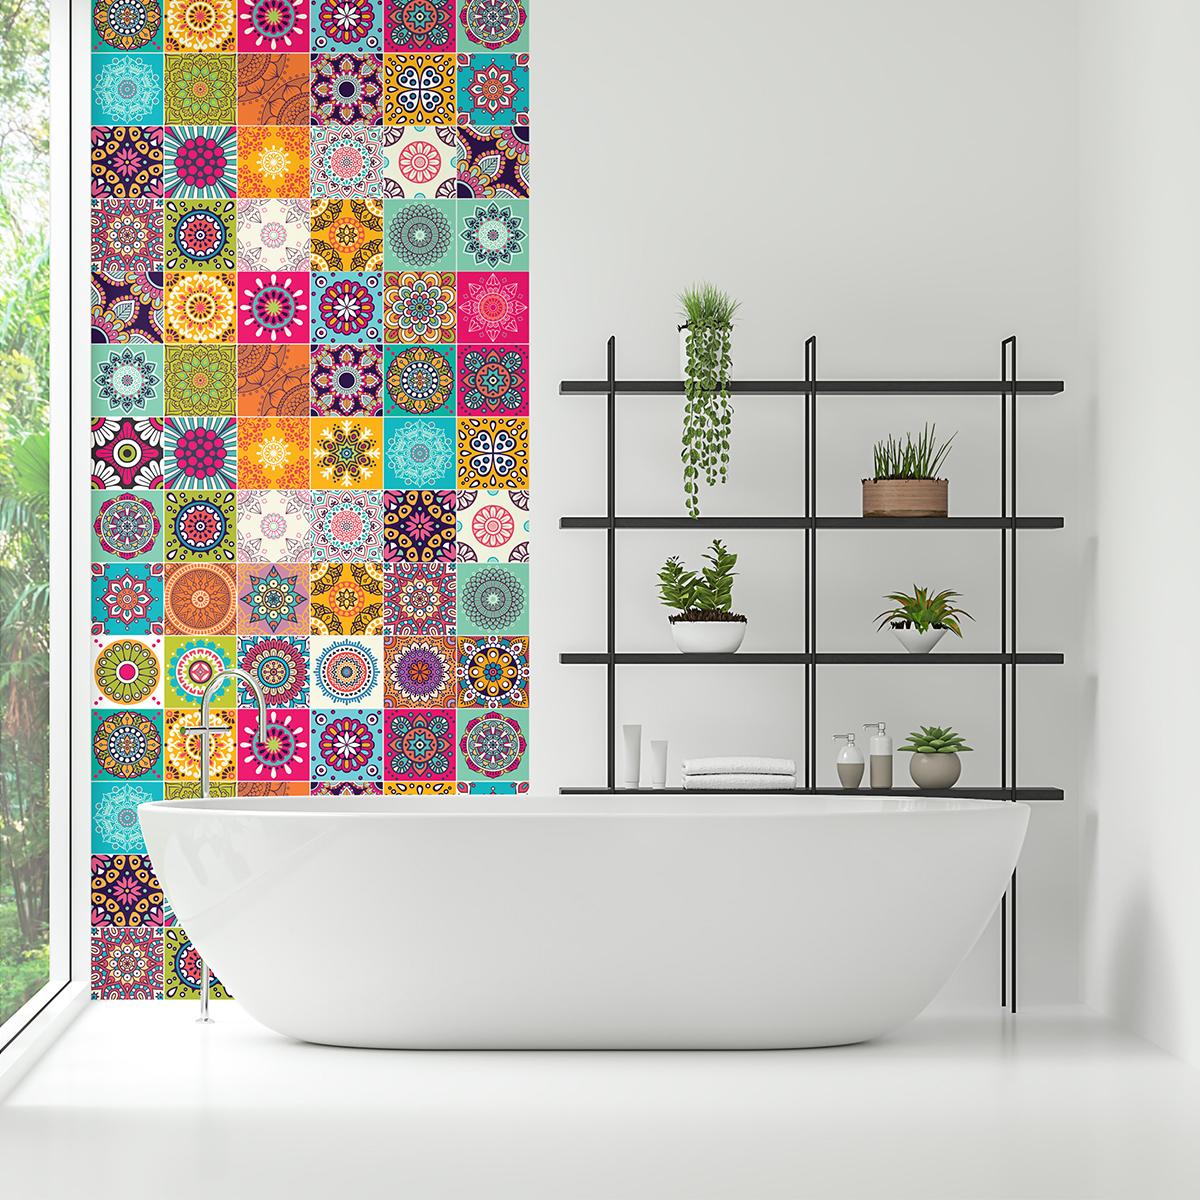 60 stickers carrelages azulejos roses multicolore salle - Stickers sur carrelage salle de bain ...